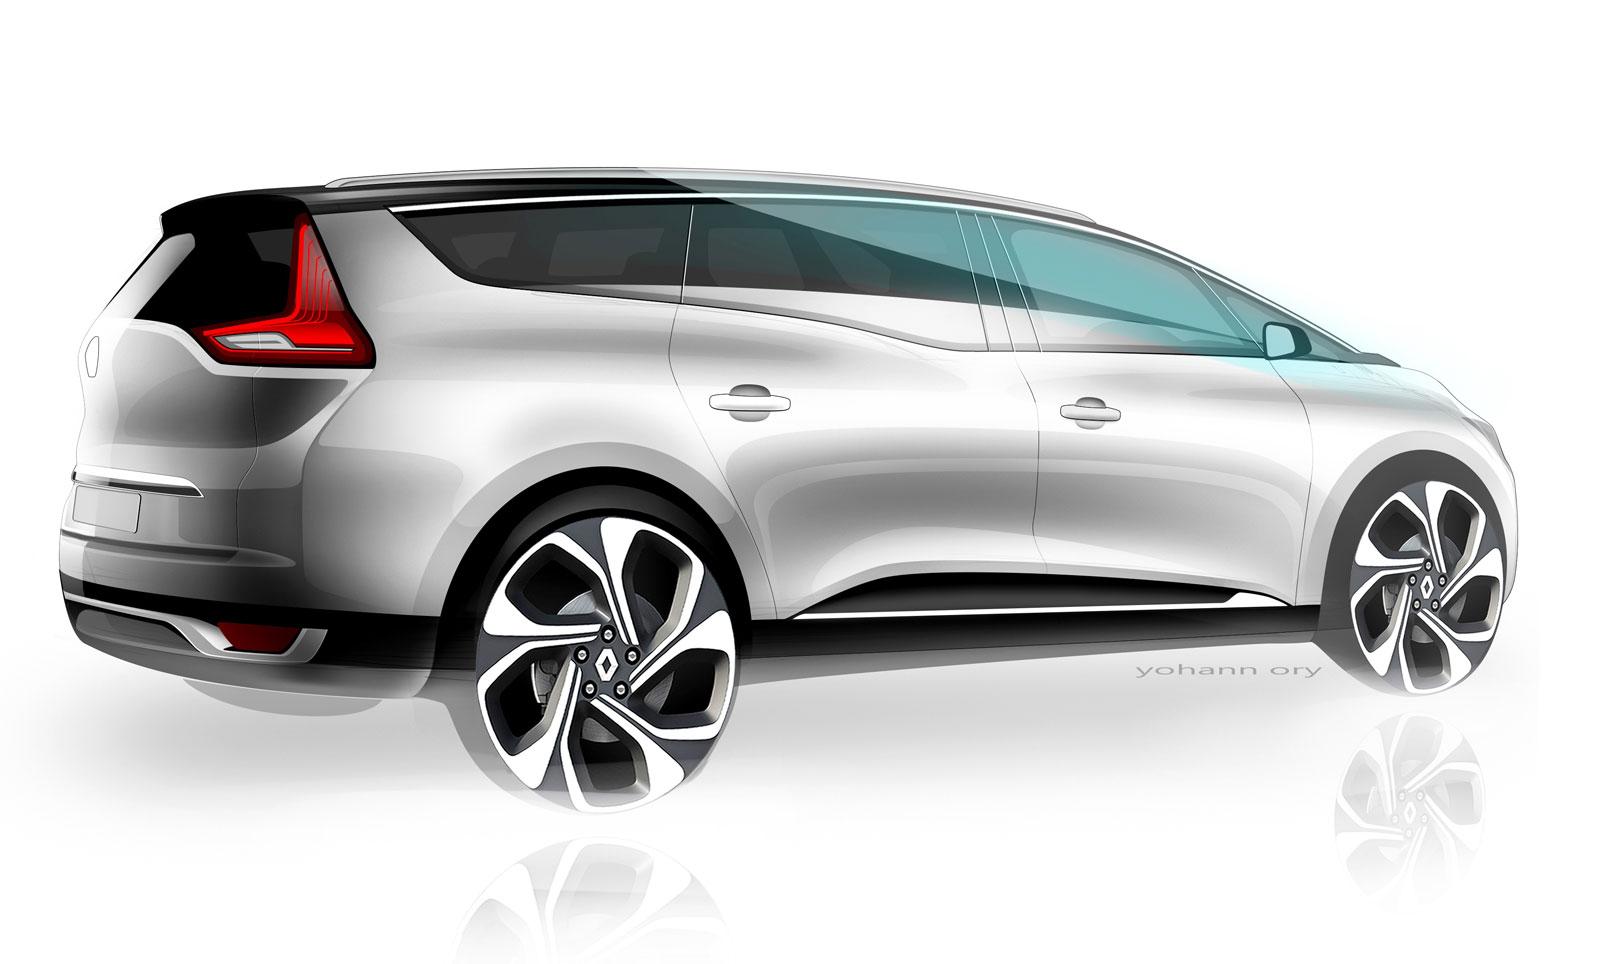 World Car Kia >> Renault Grand Scenic - Design Sketch Render - Car Body Design